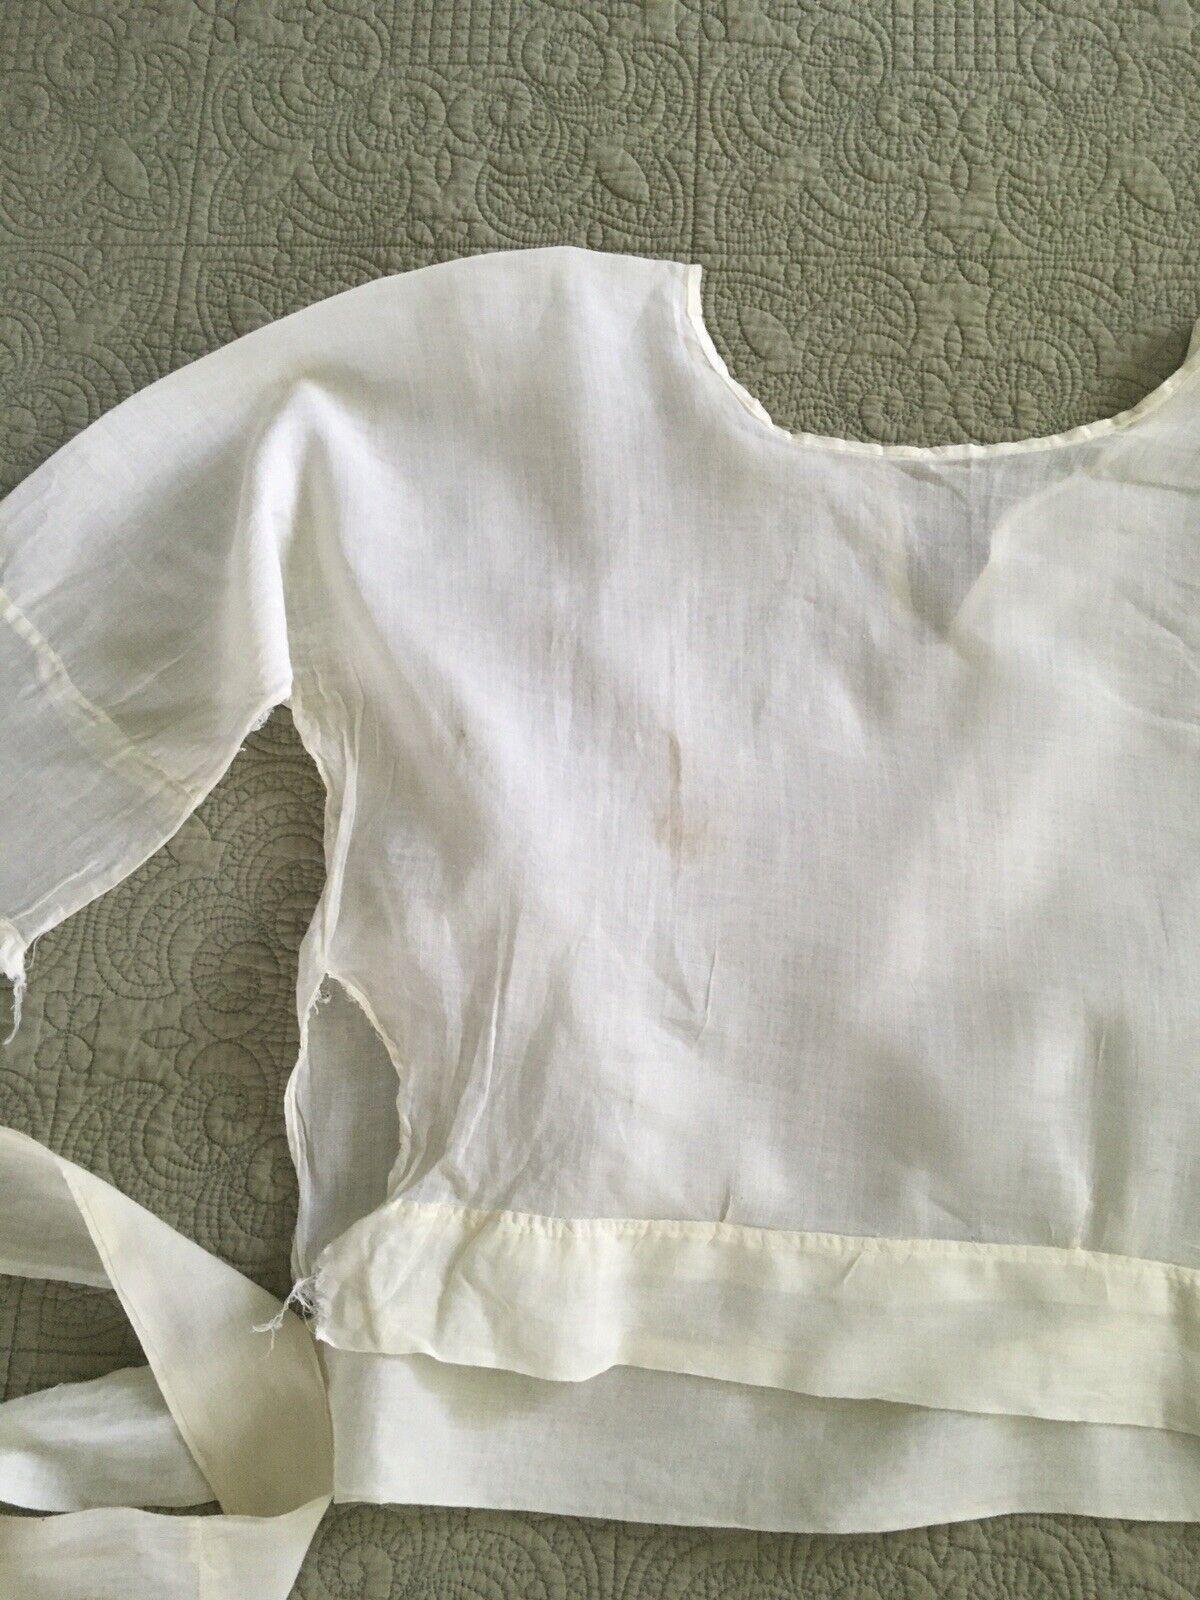 Antique Edwardian Victorian Shirtwaist Blouse - image 9